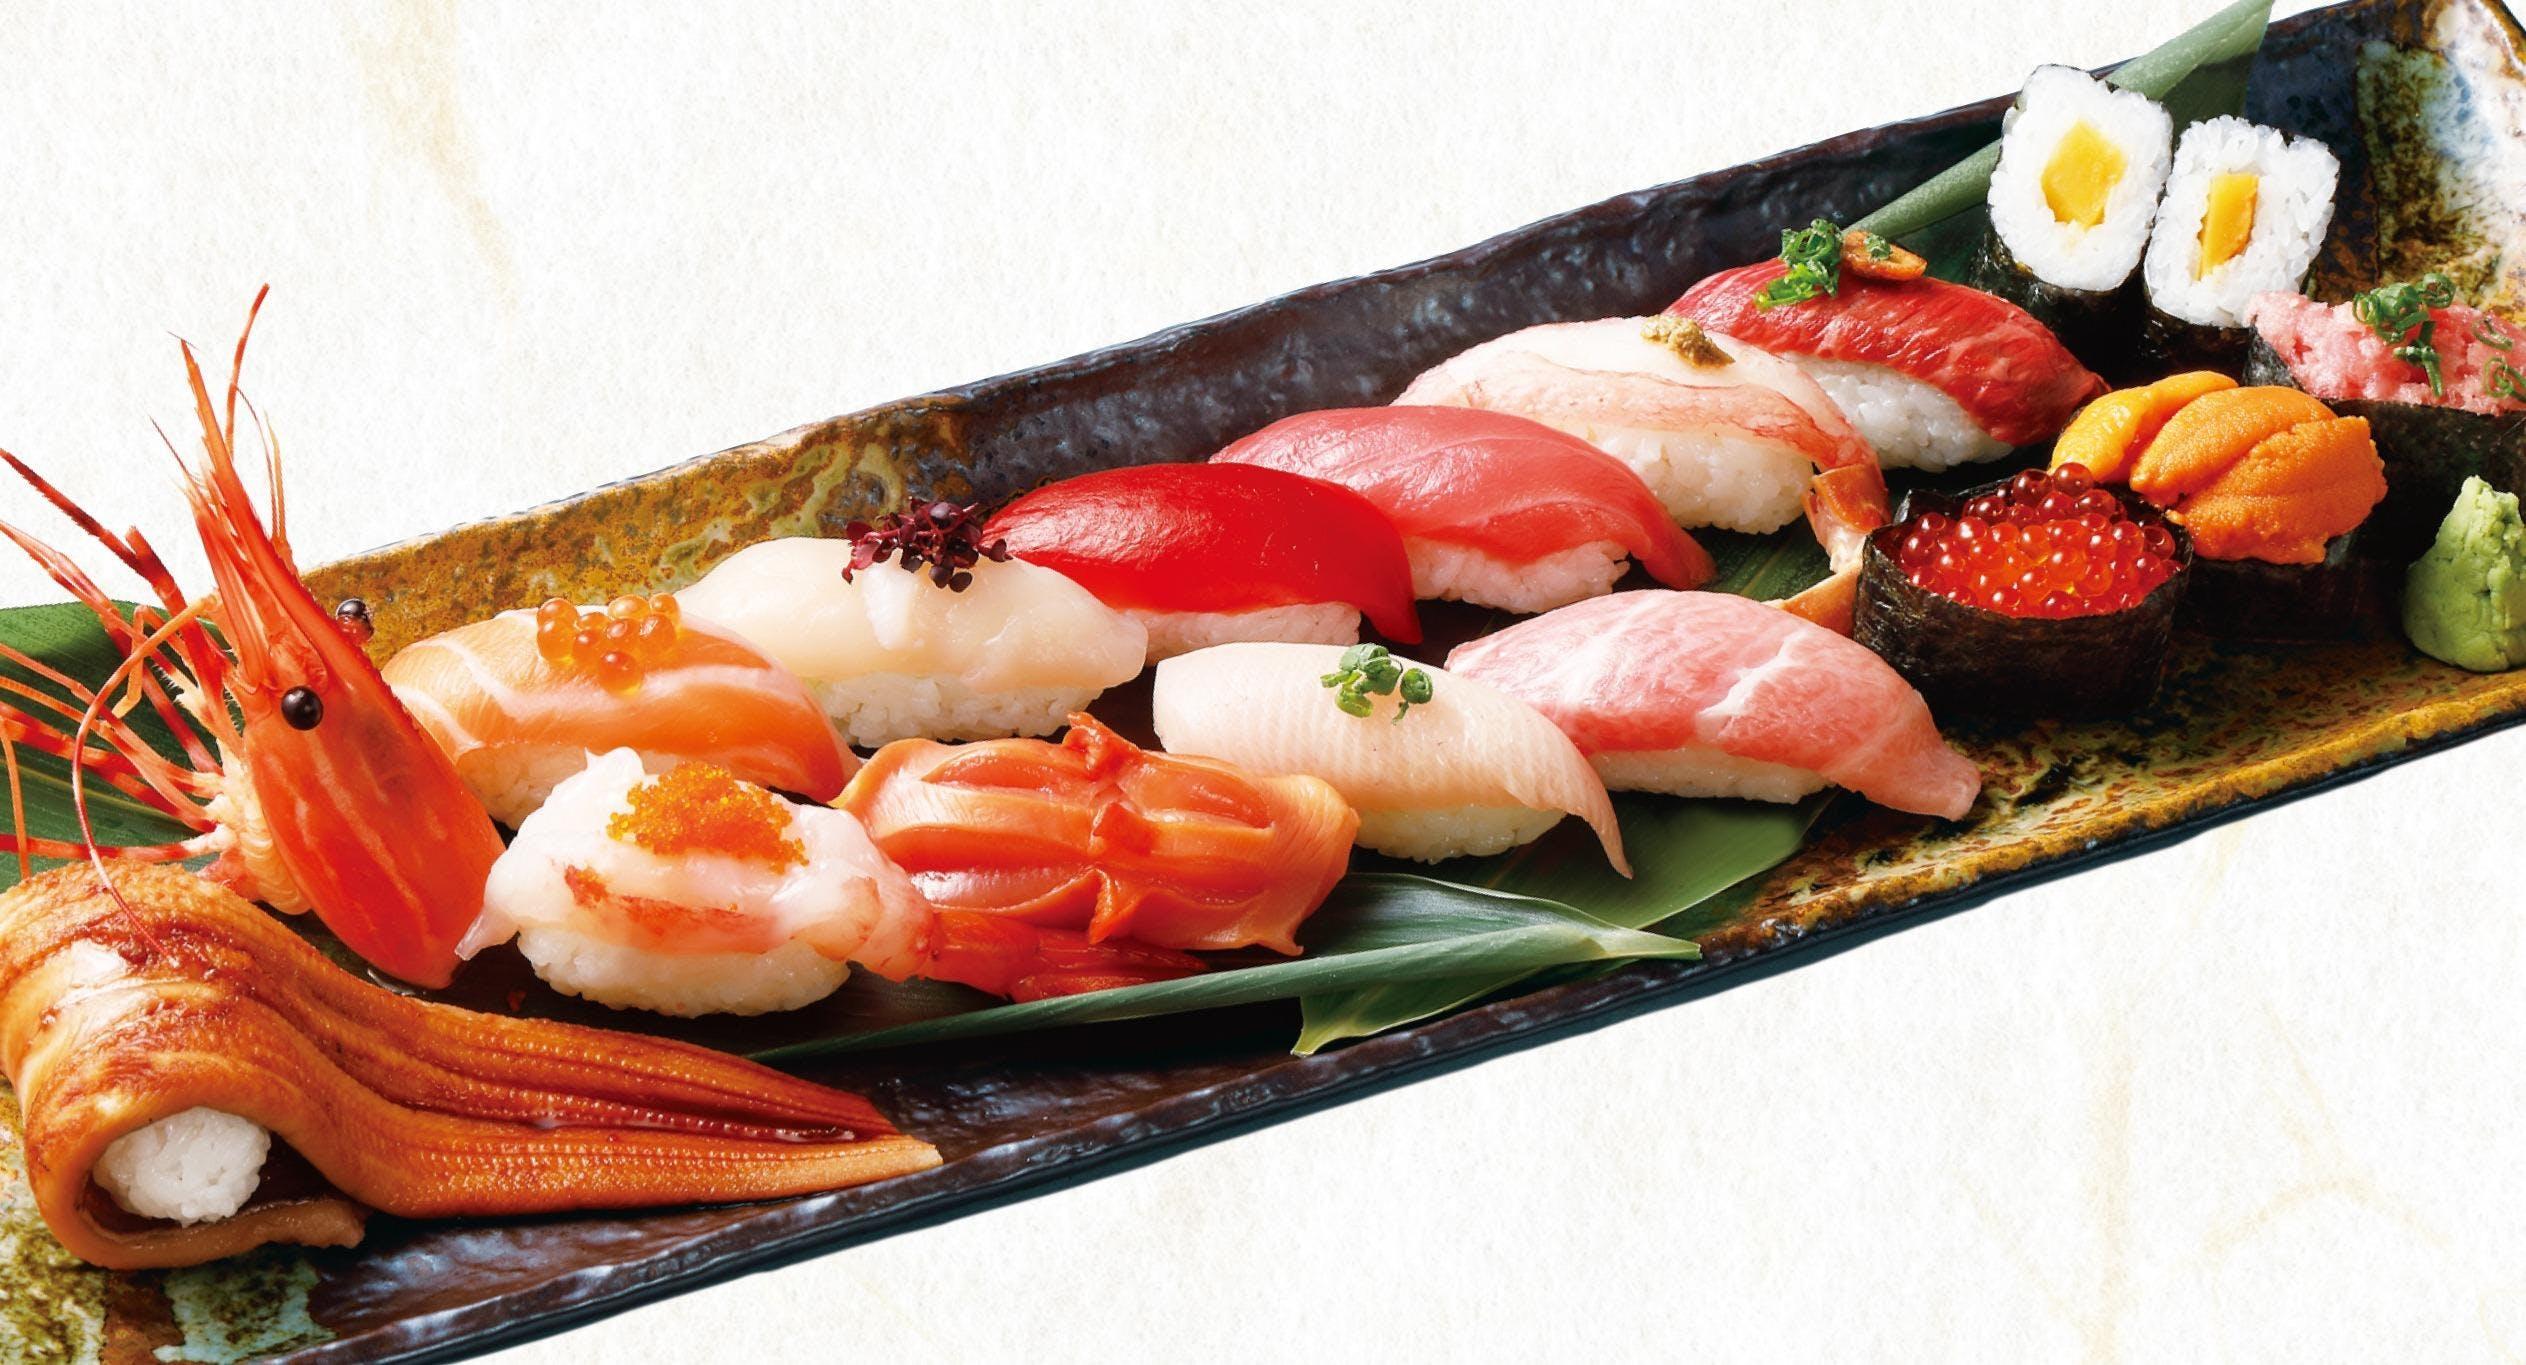 Ka Ma Do Japanese Restaurant 火間土日本料理